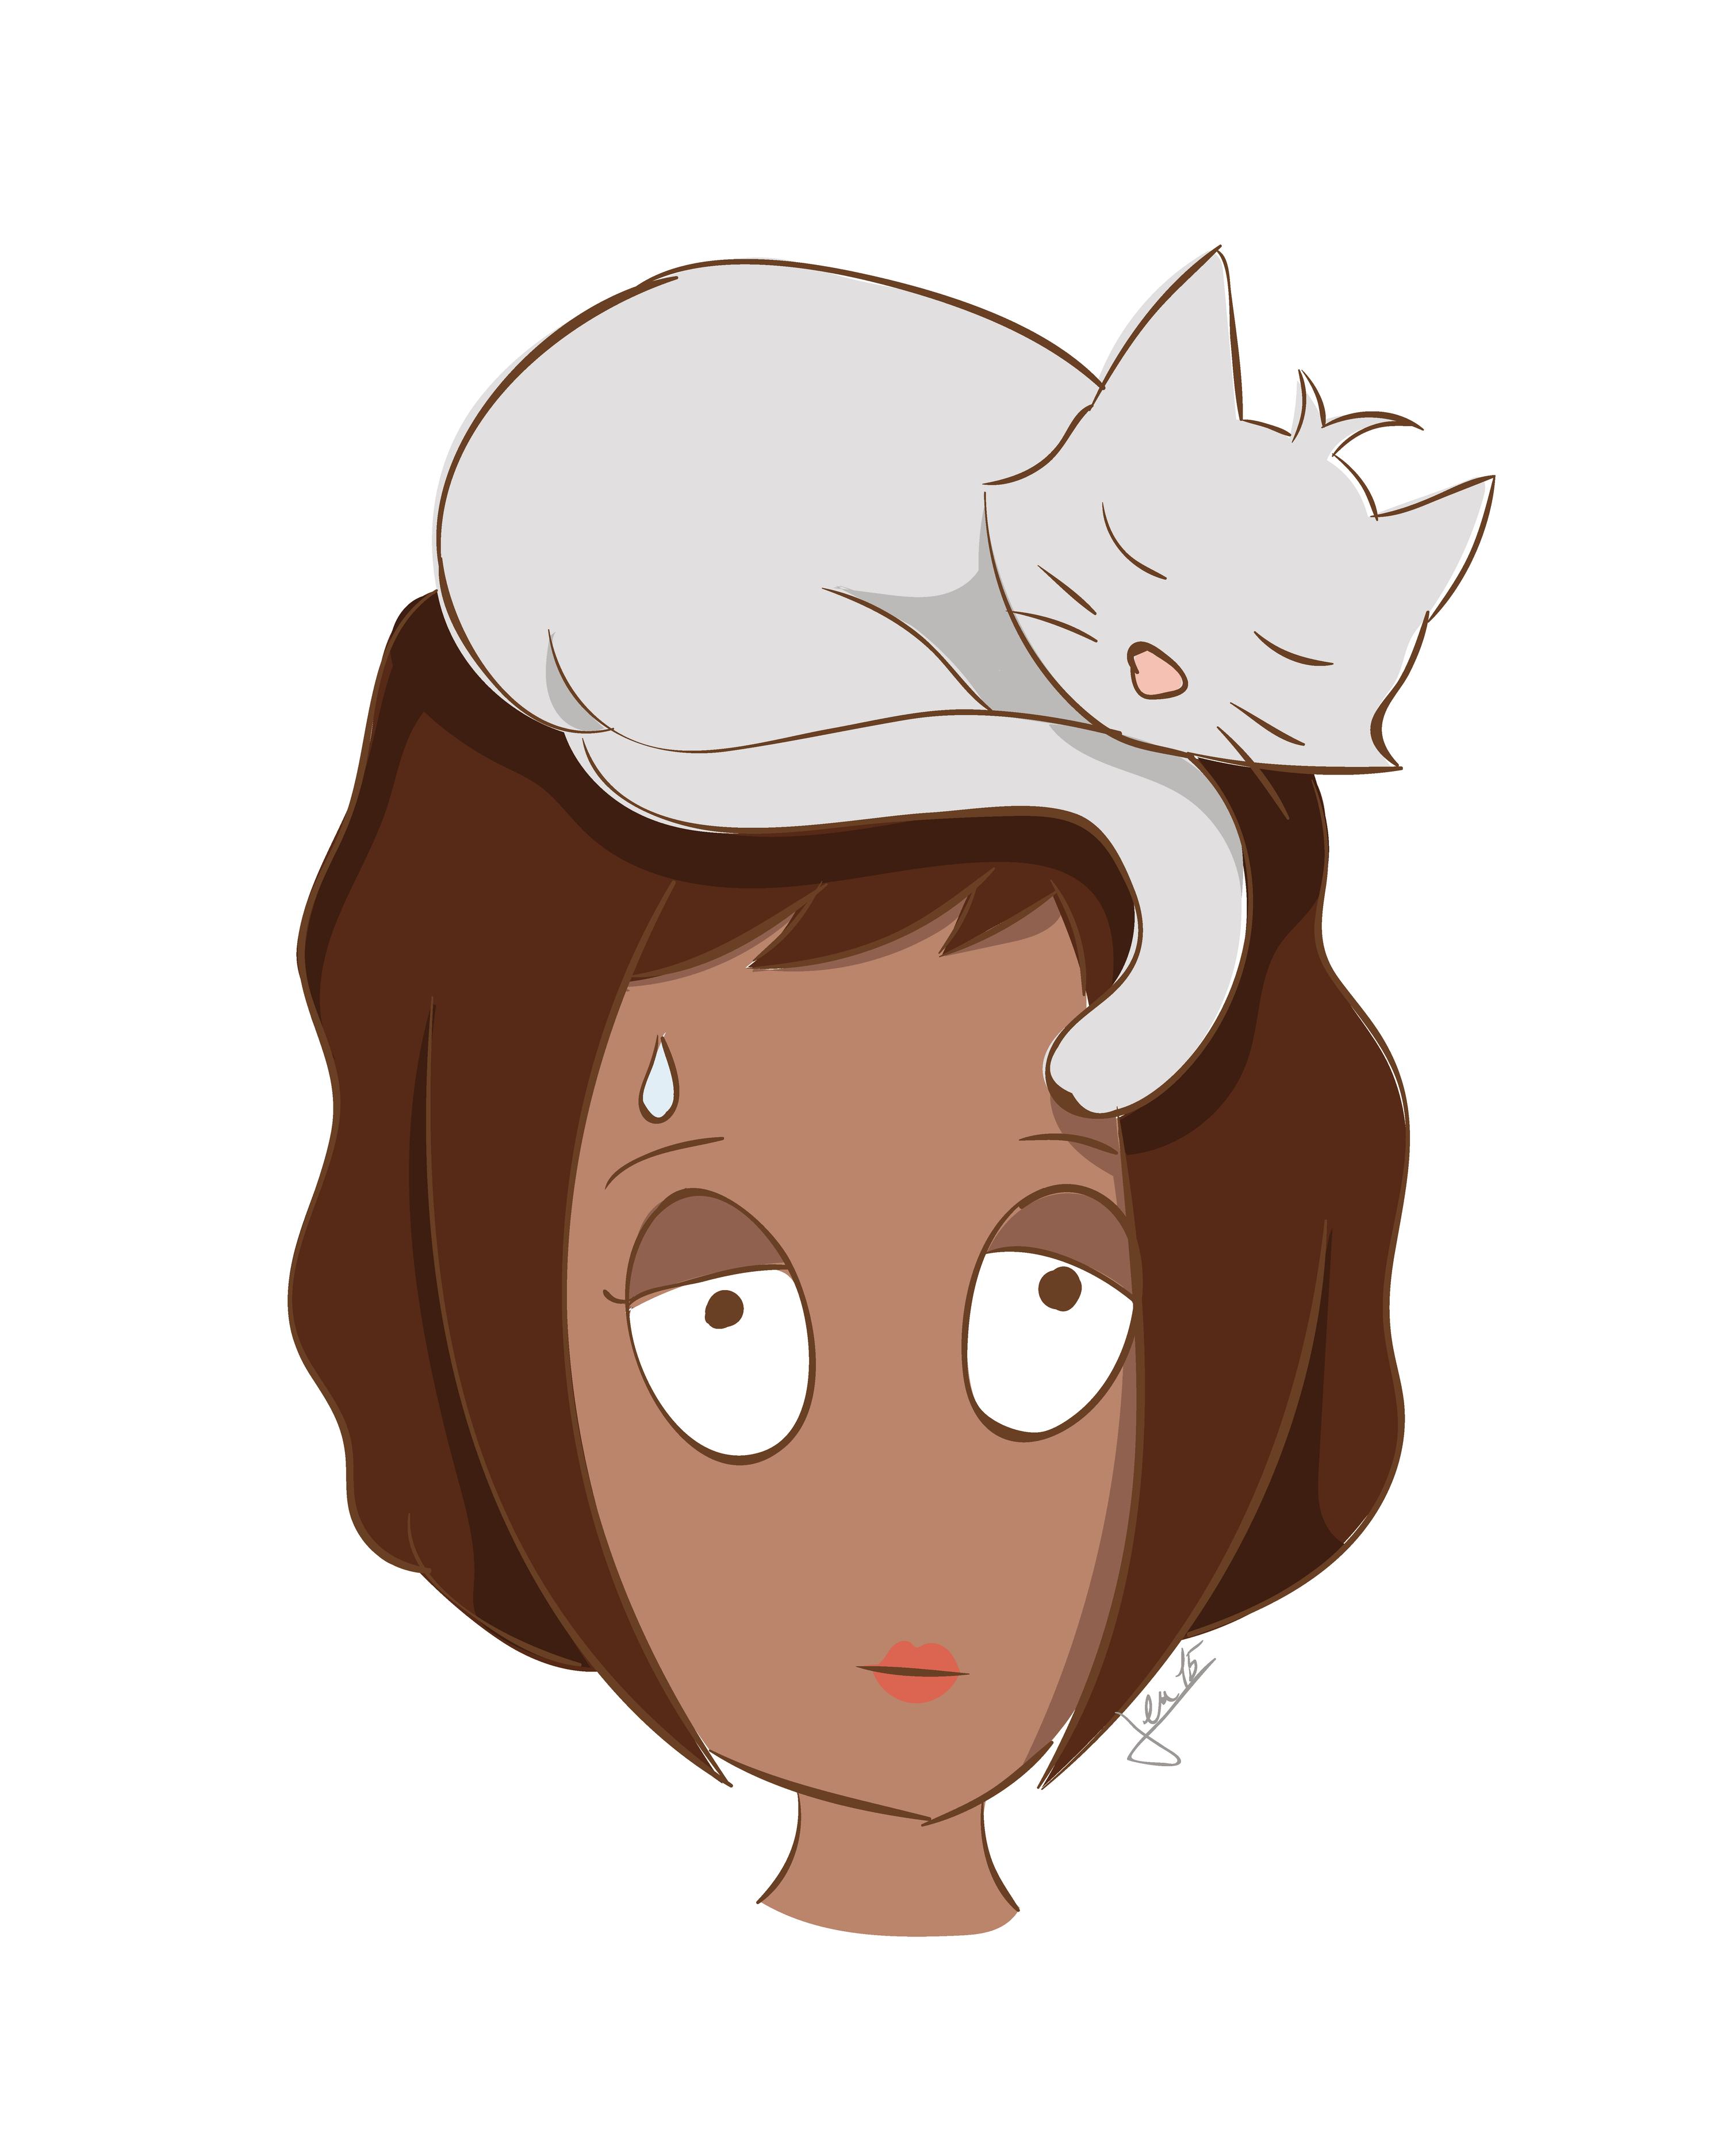 Ex. 1 Un chat prudent